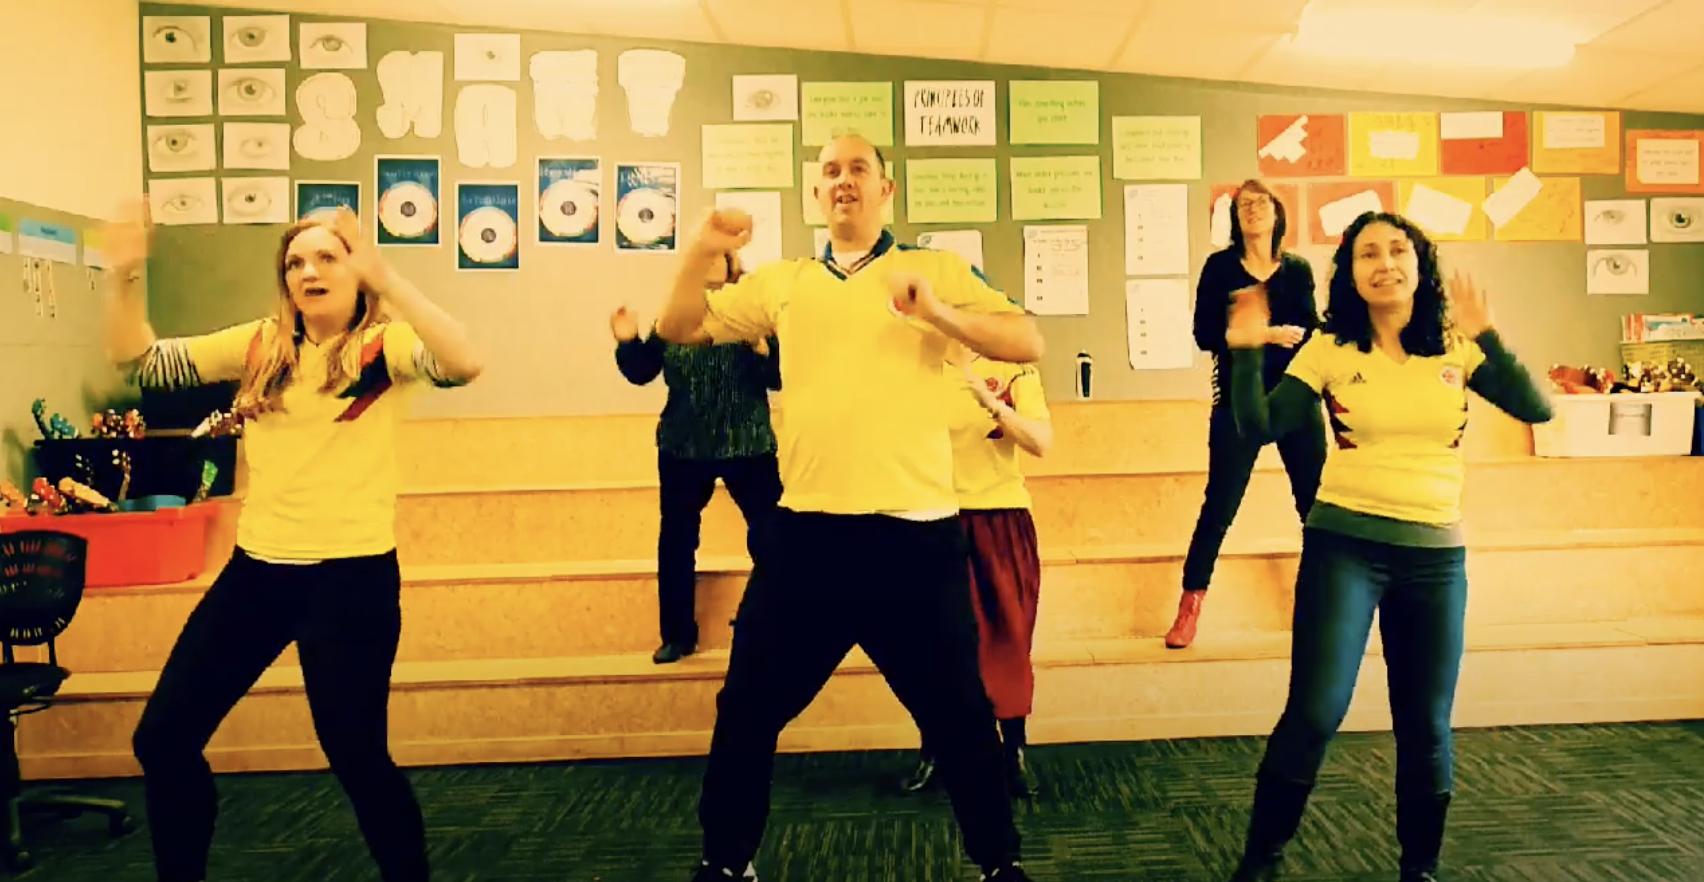 Somerfield Te Kura Wairepo teachers dancing on a classroom